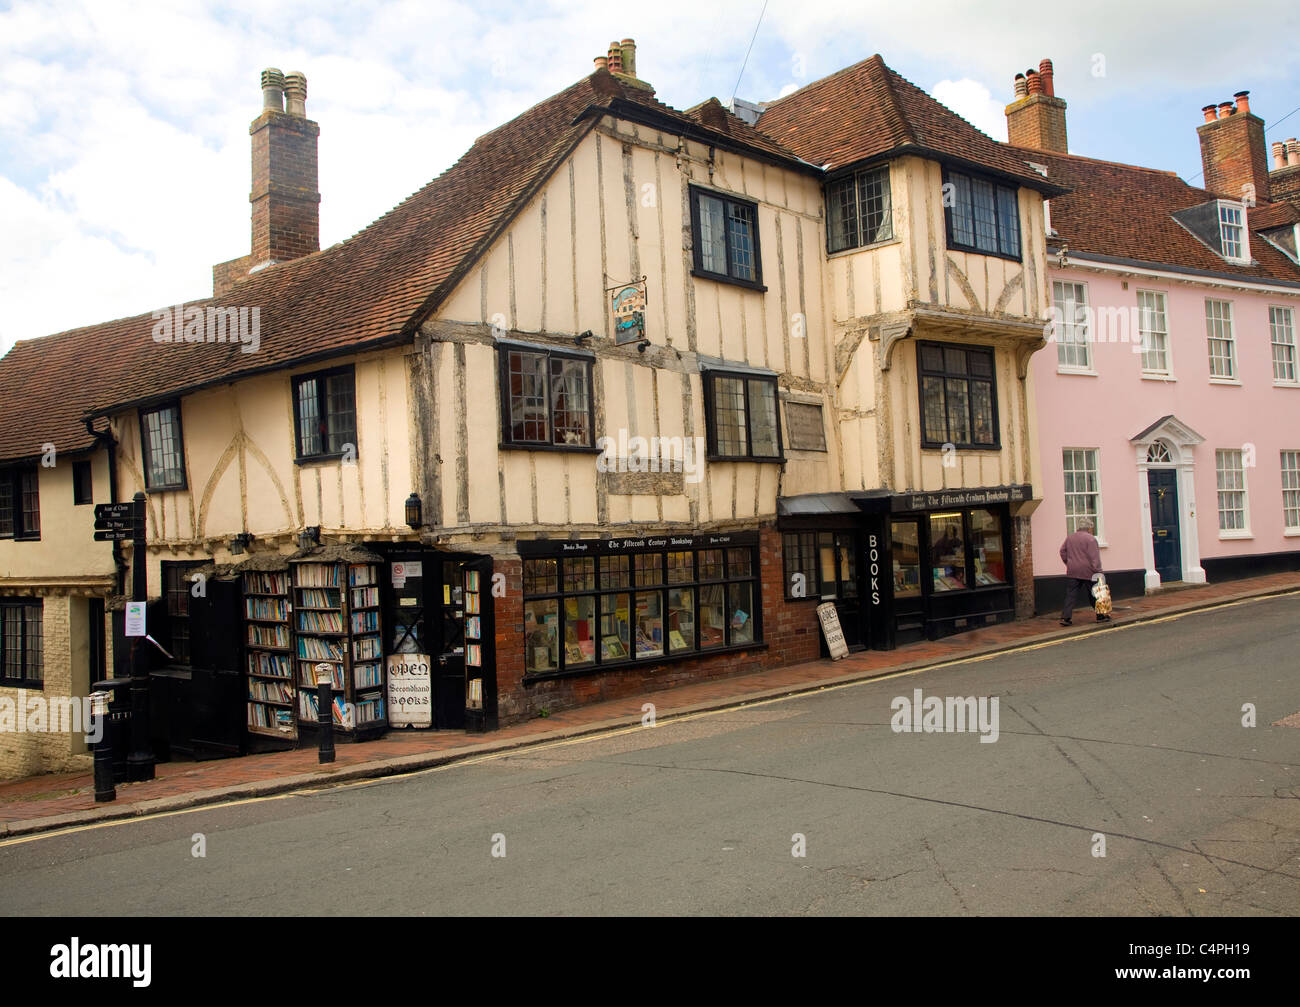 Fifteenth century bookshop, Lewes, East Sussex, England - Stock Image